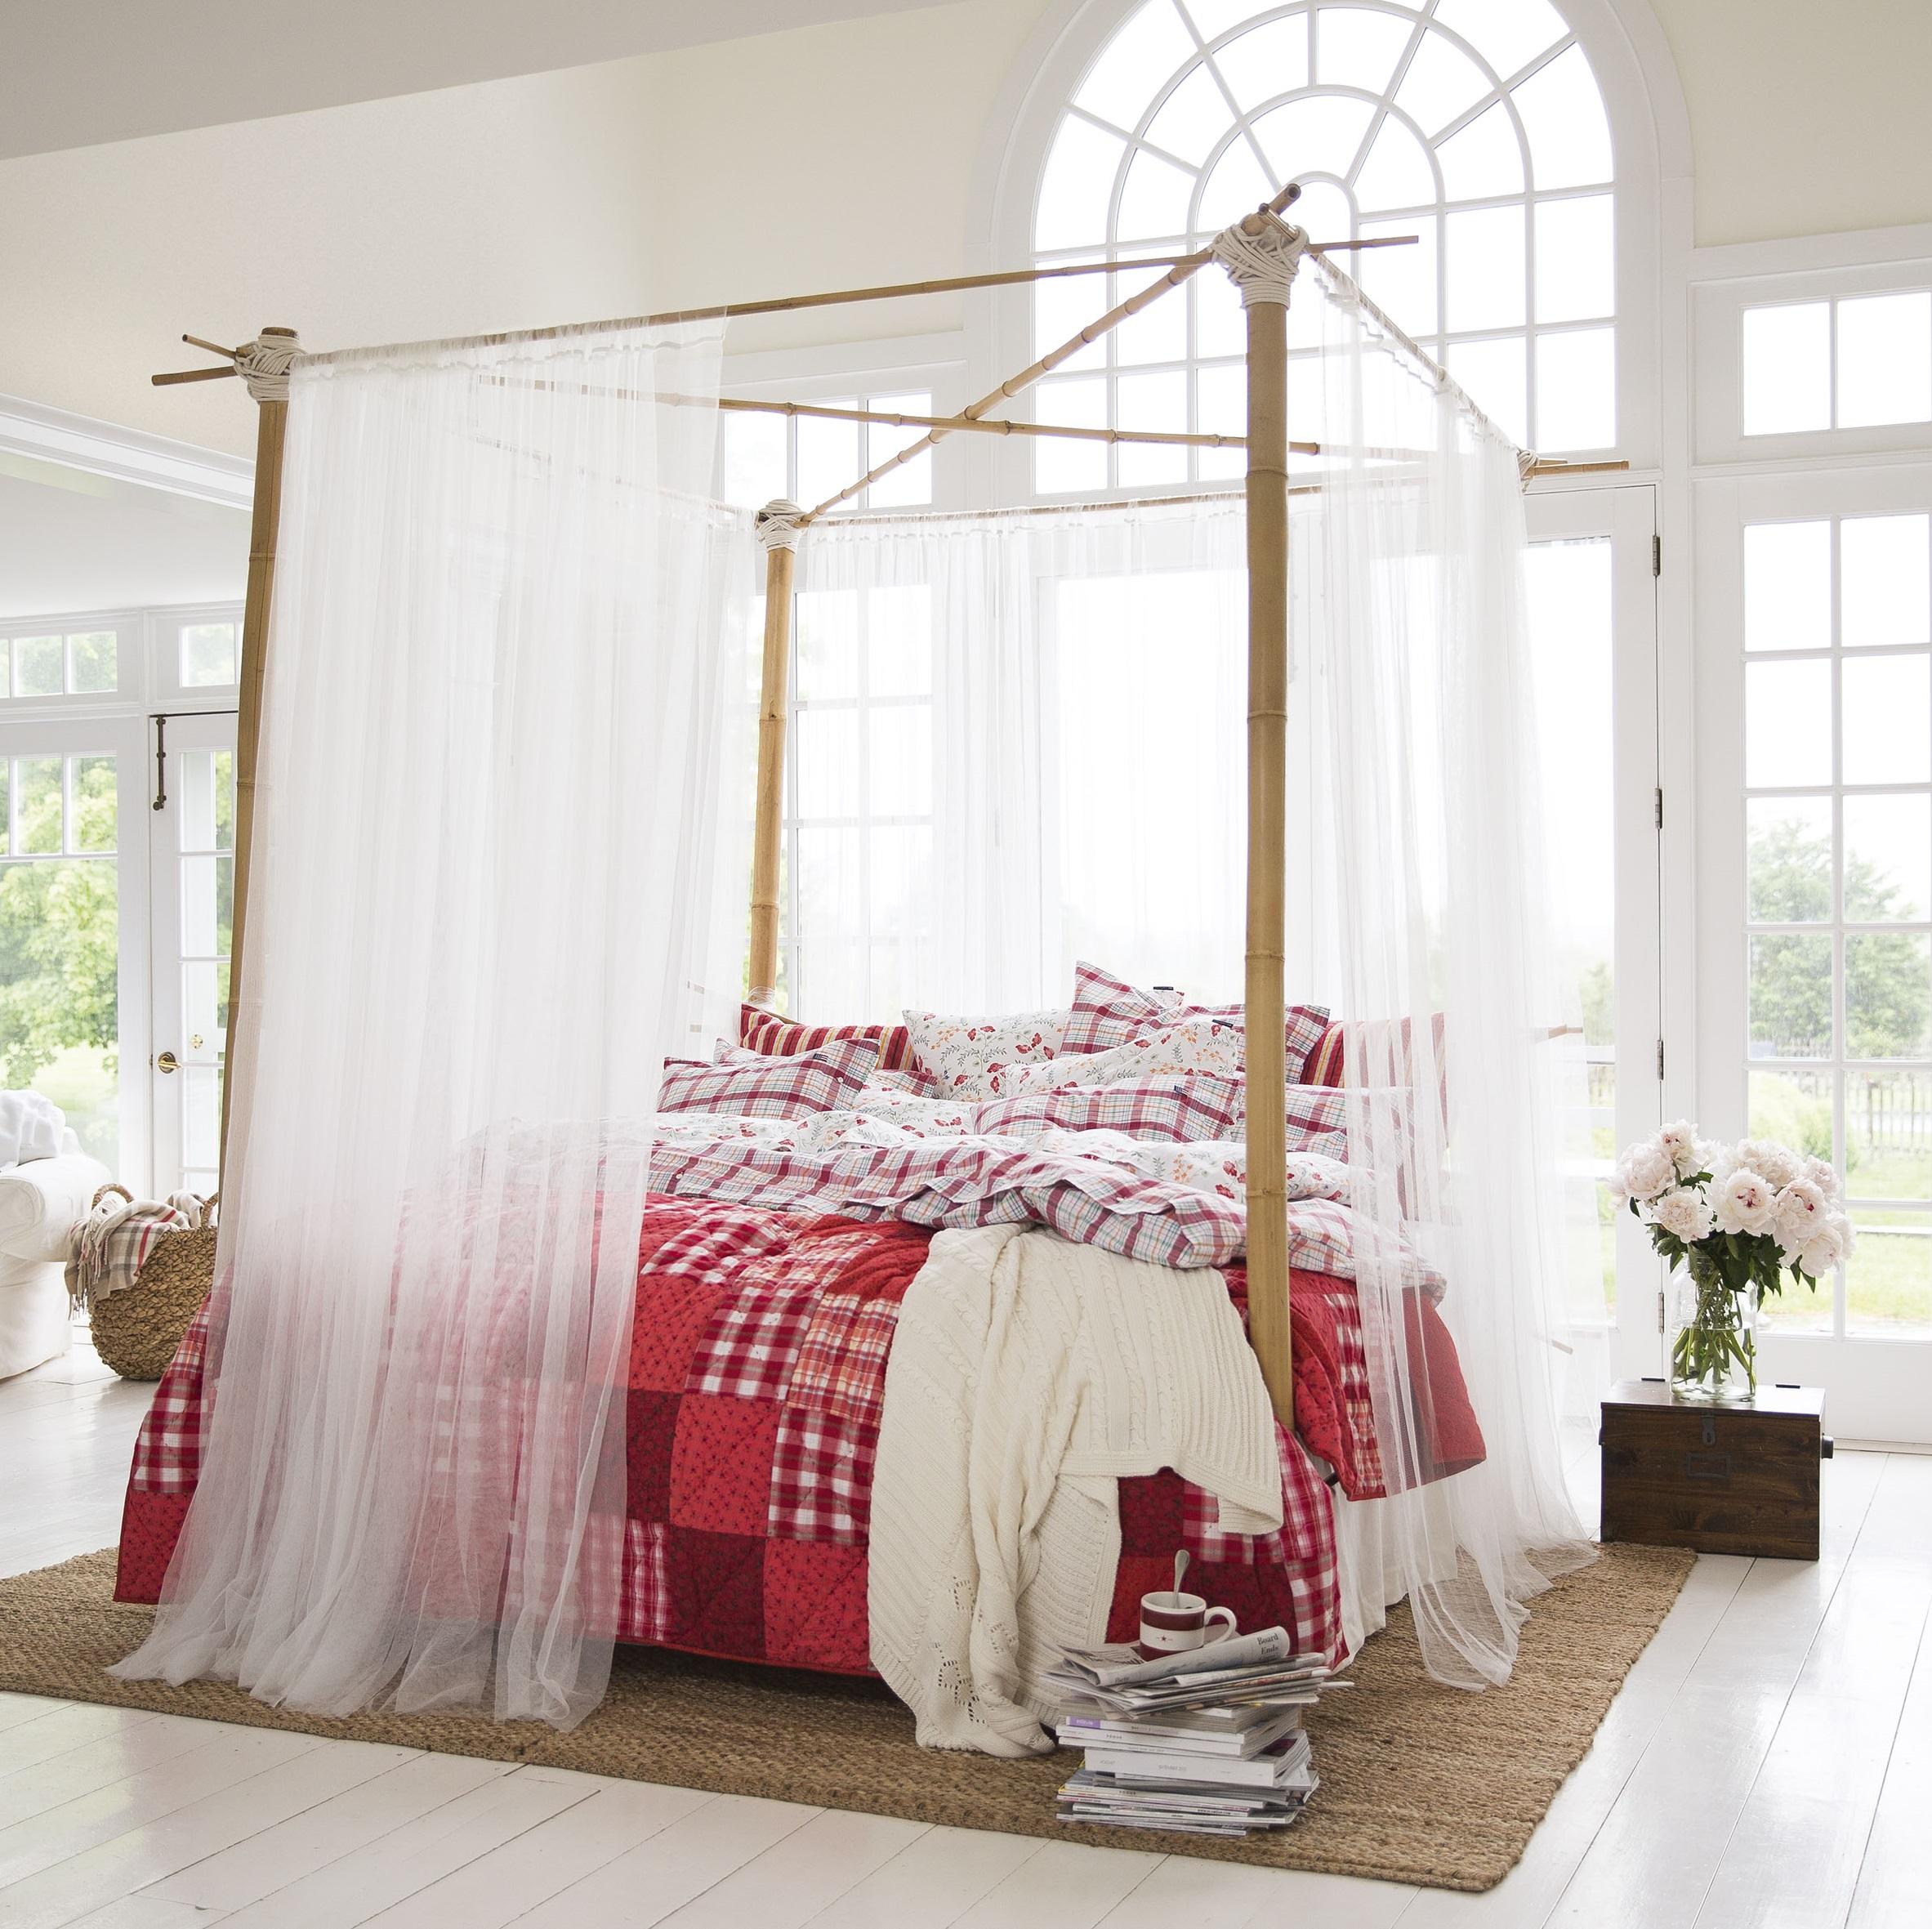 lexington striped country cushion tutti decor ltd. Black Bedroom Furniture Sets. Home Design Ideas